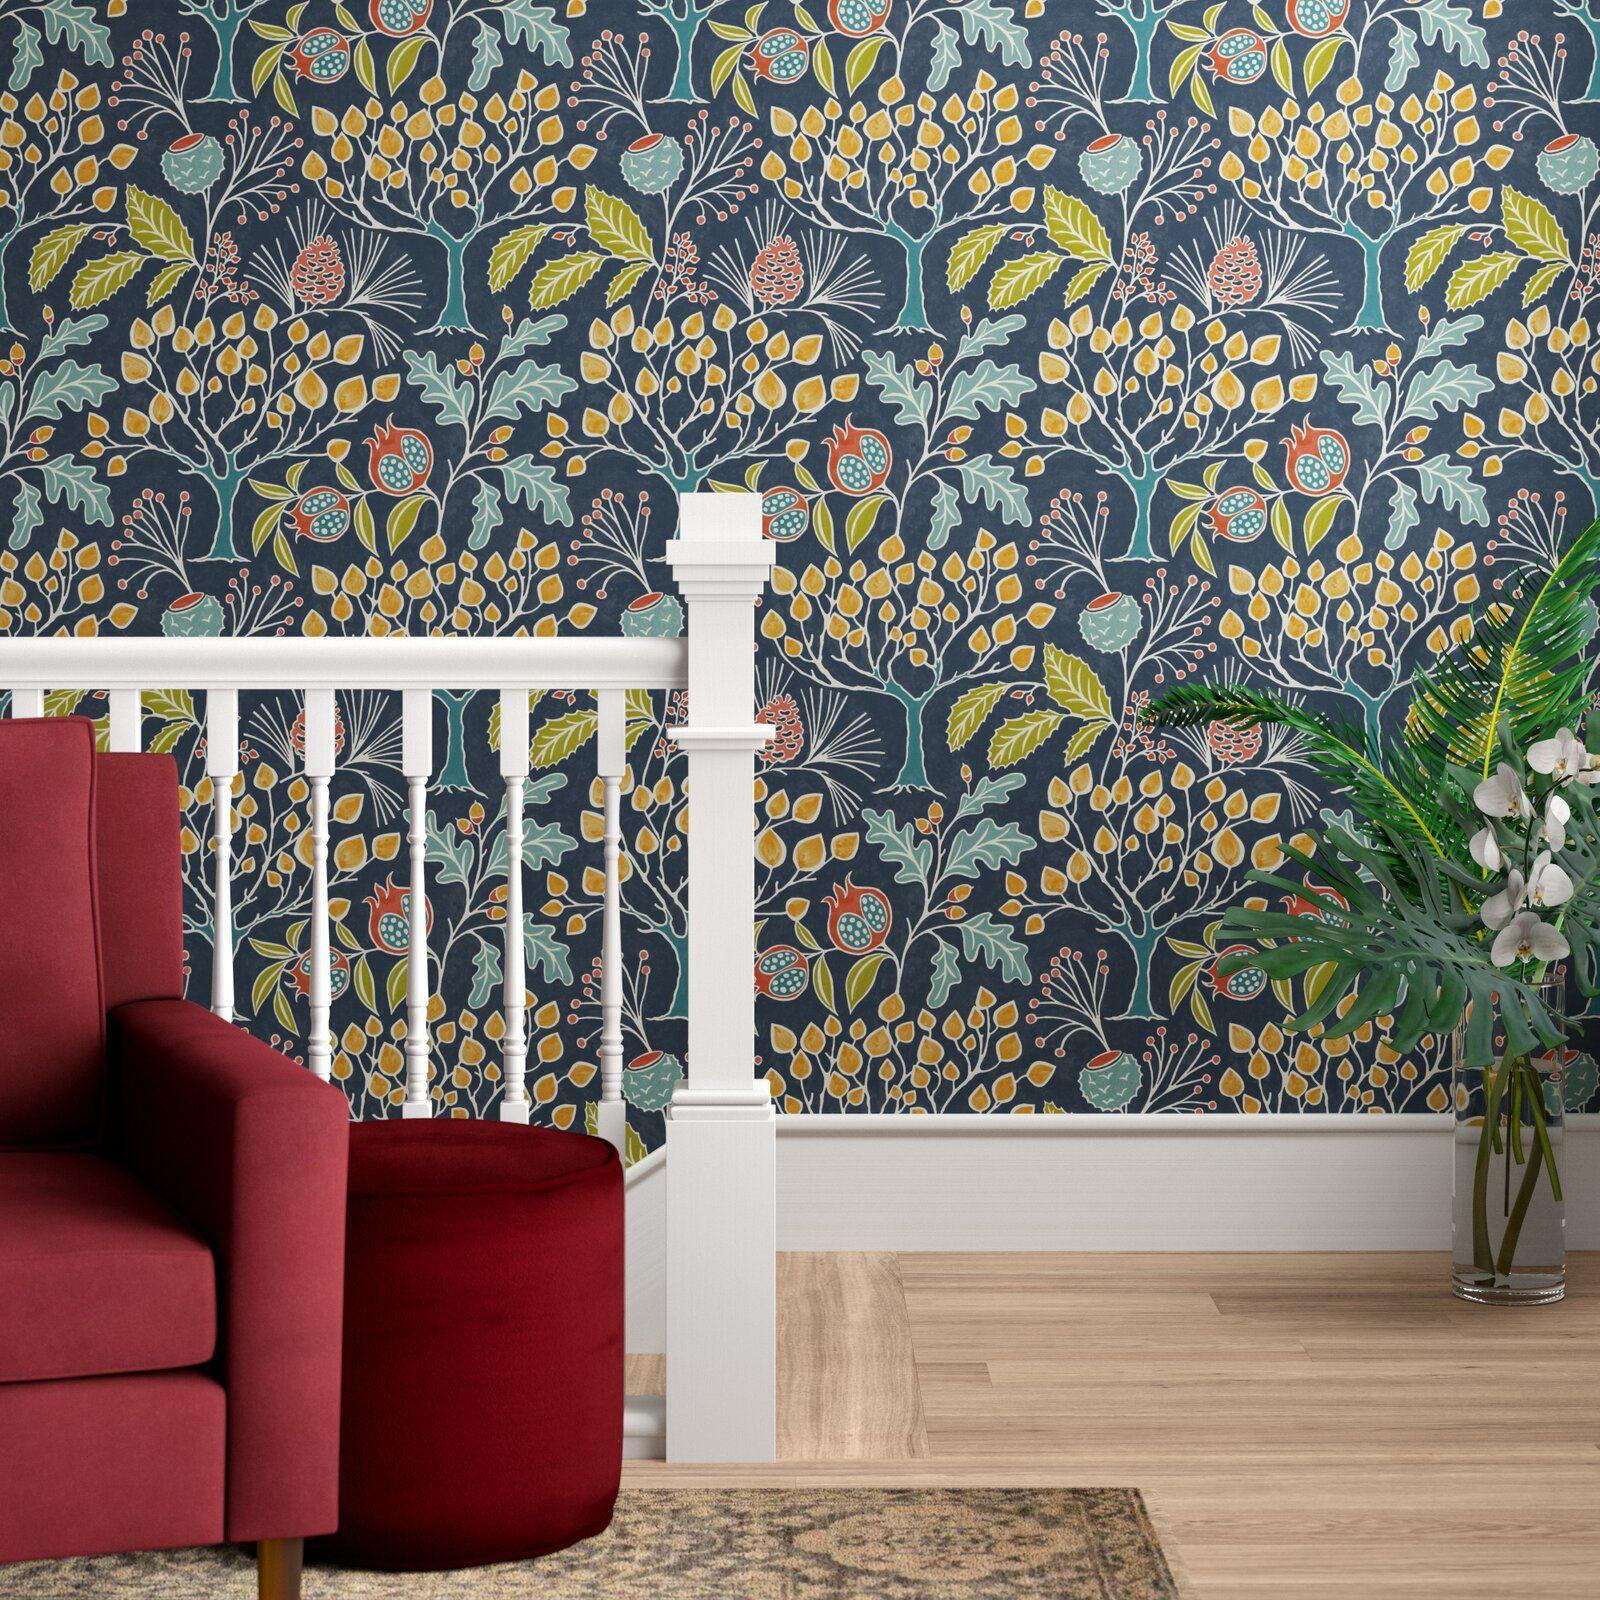 Asotin Garden Semi Gloss Peel And Stick Wallpaper Roll In